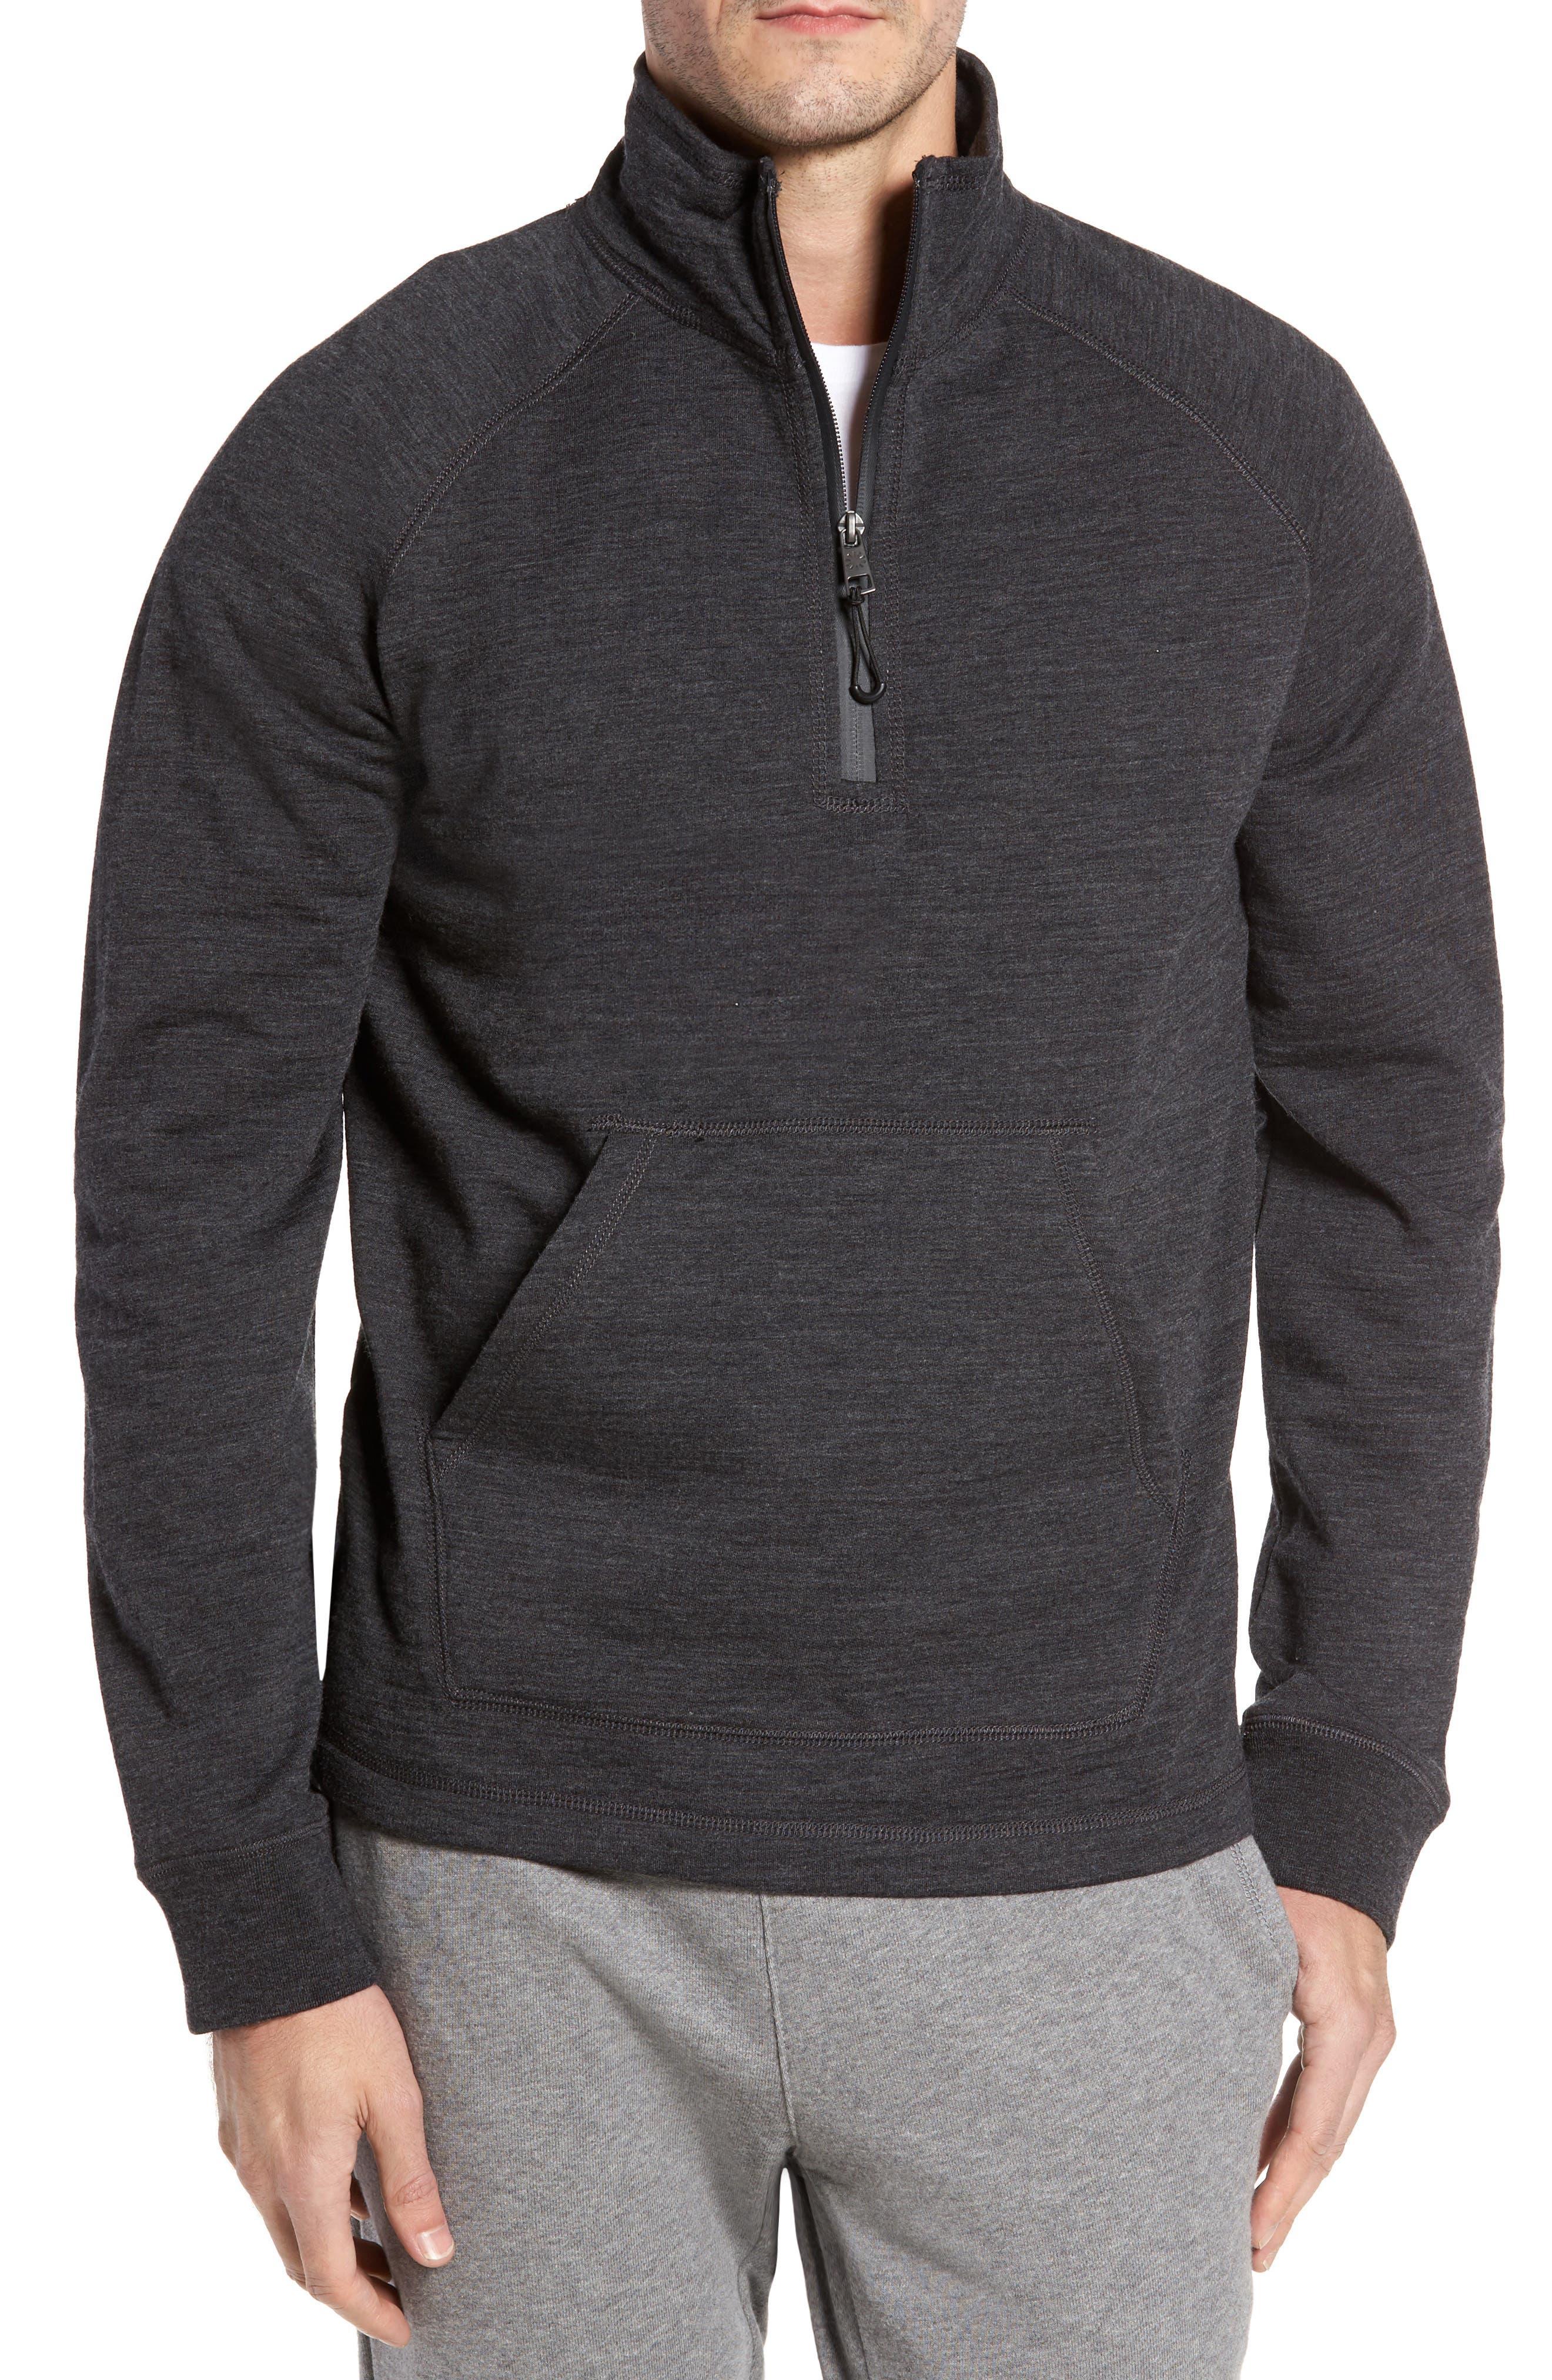 Main Image - UGG® Merino Wool Quarter Zip Pullover